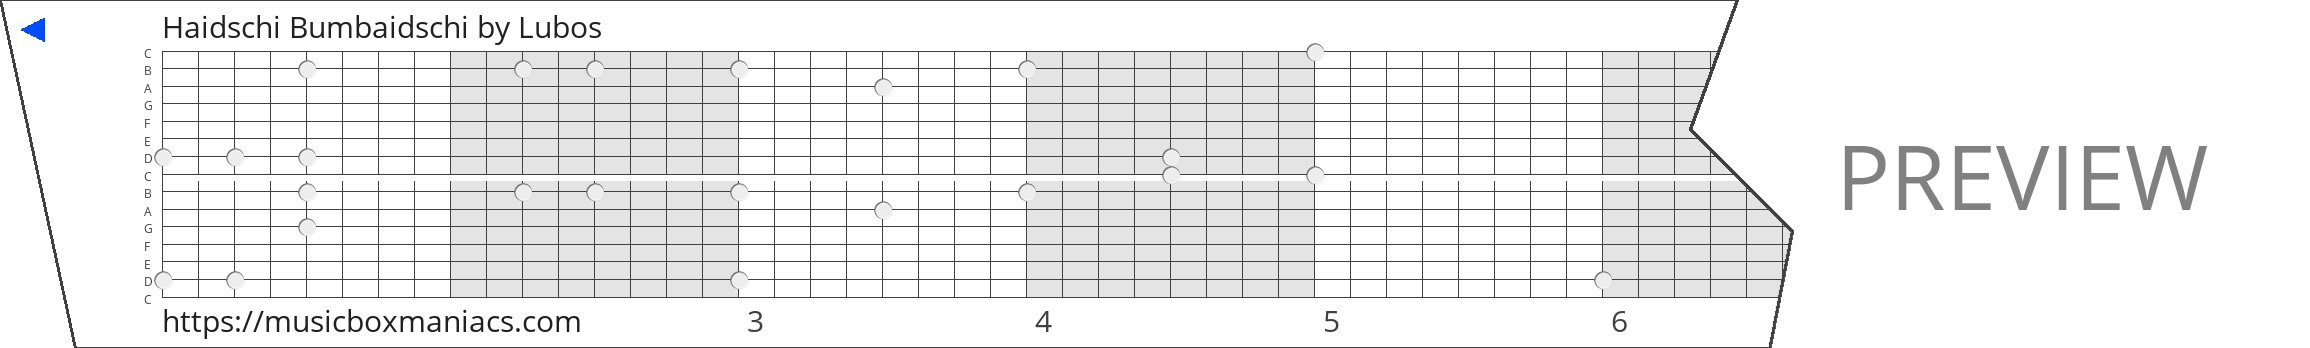 Haidschi Bumbaidschi 15 note music box paper strip